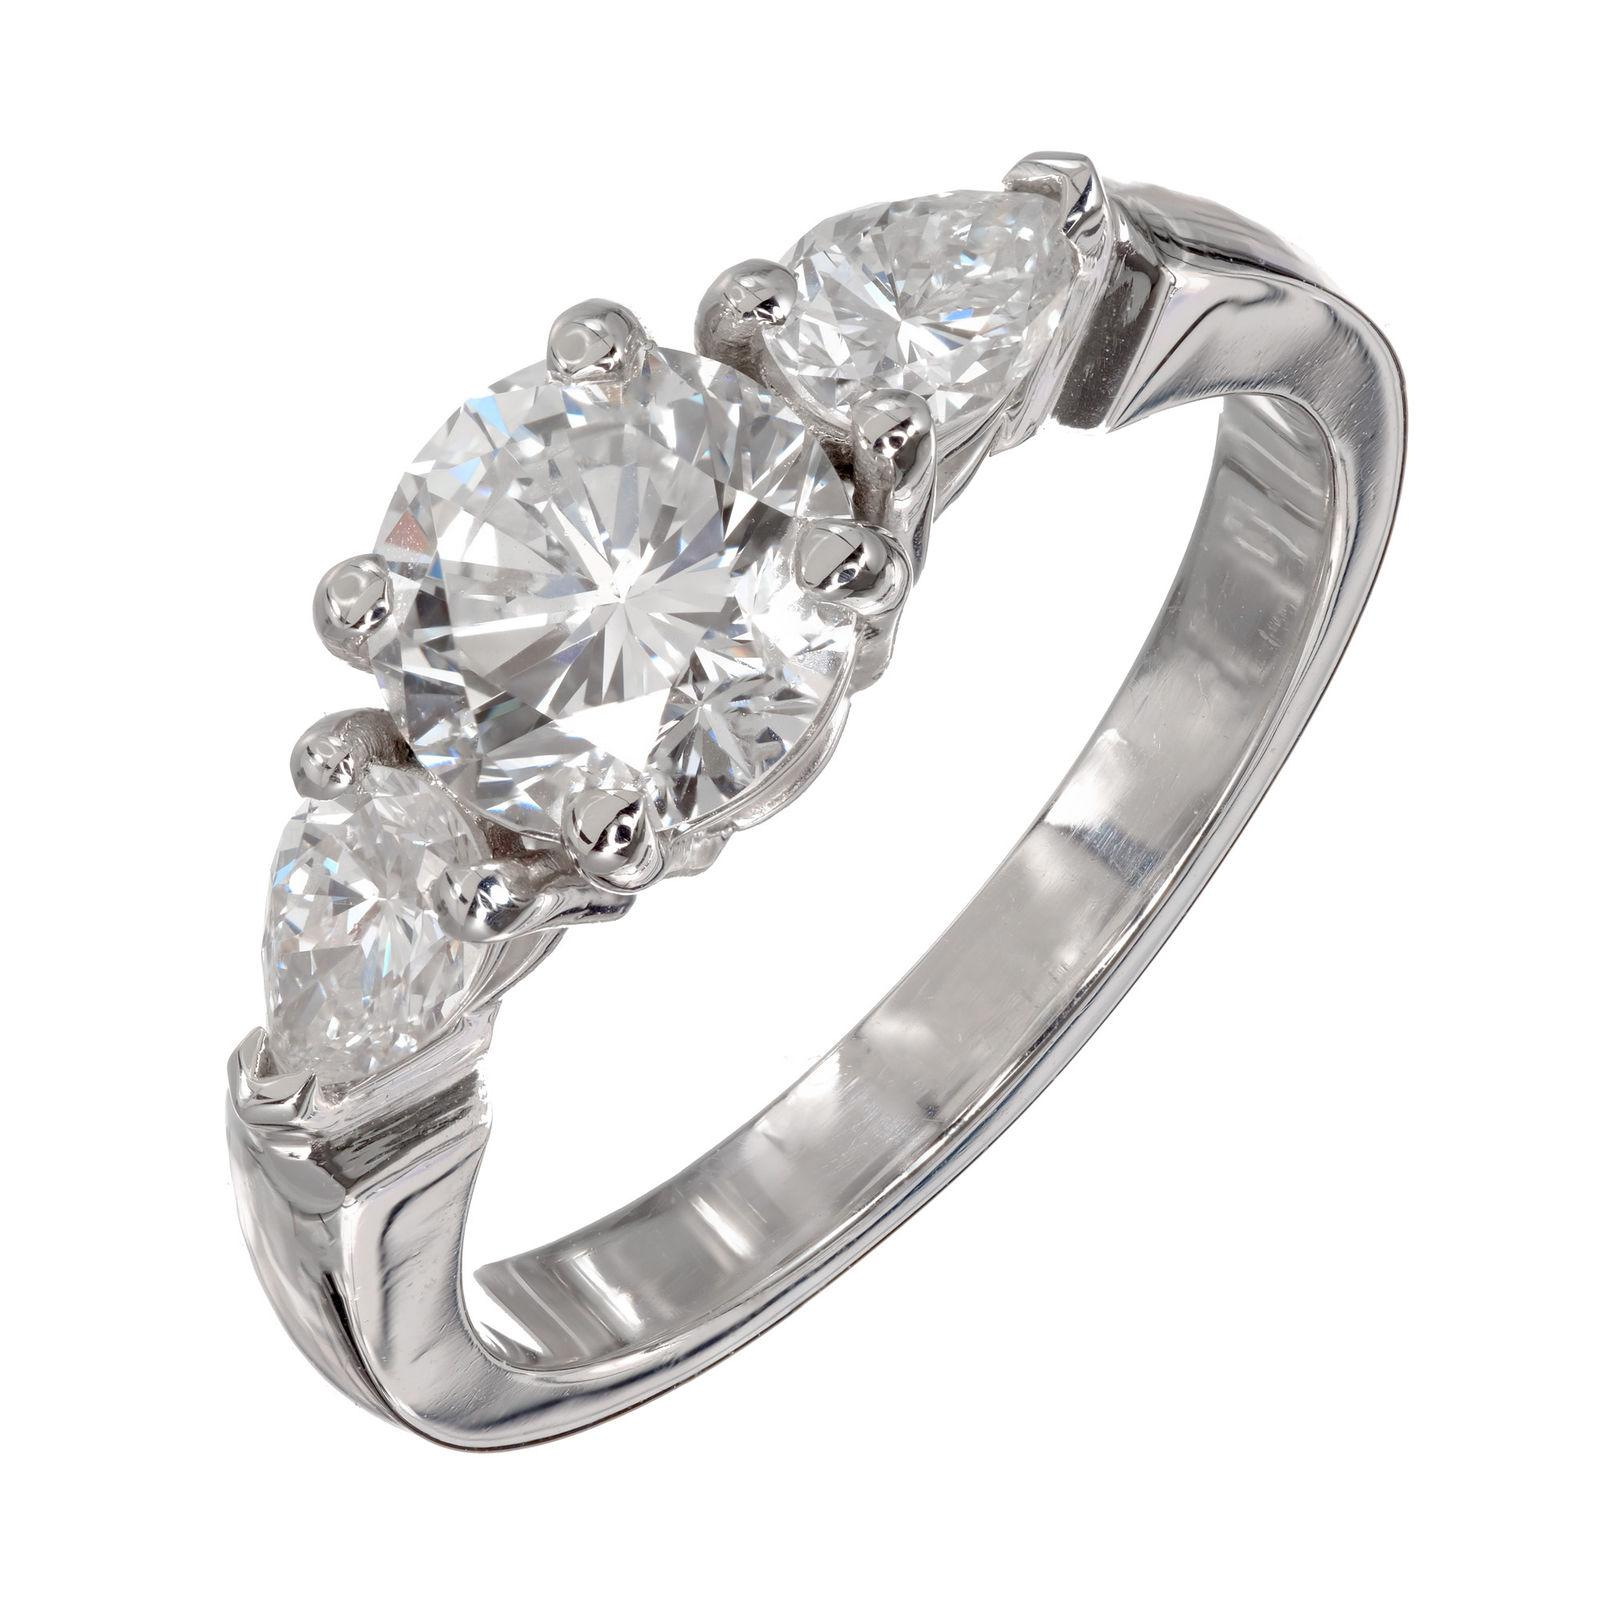 Peter Suchy GIA Certified 1.58 Carat Diamond Platinum Engagement Ring